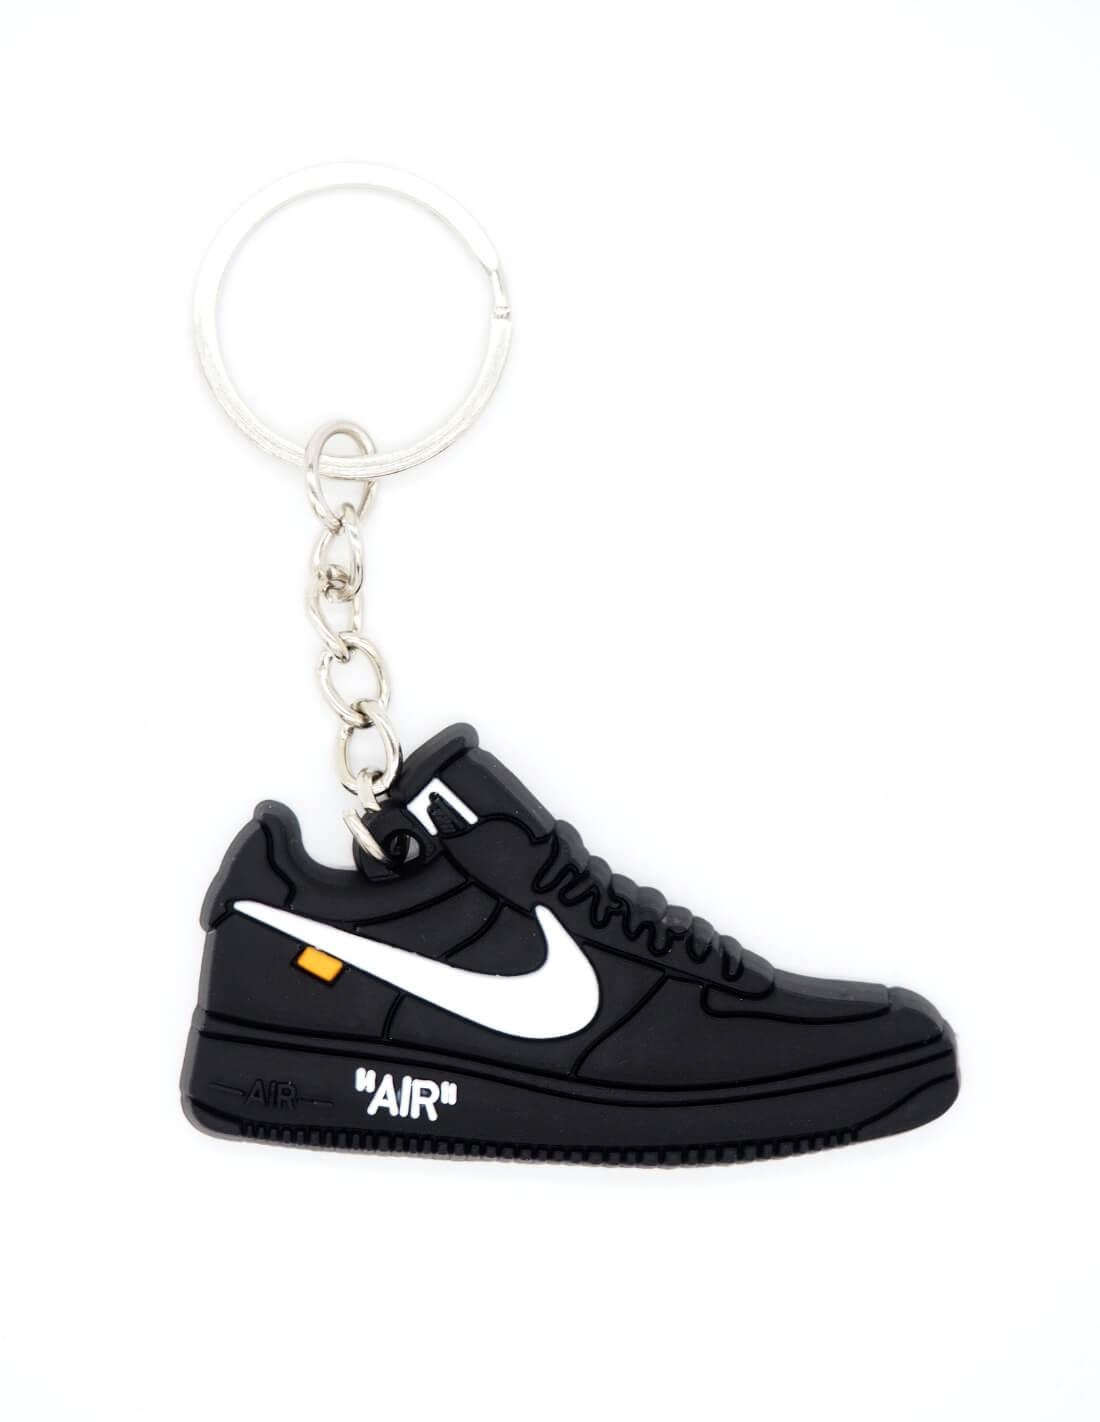 Porte clé Nike air force 1 Off white black| Fskorp